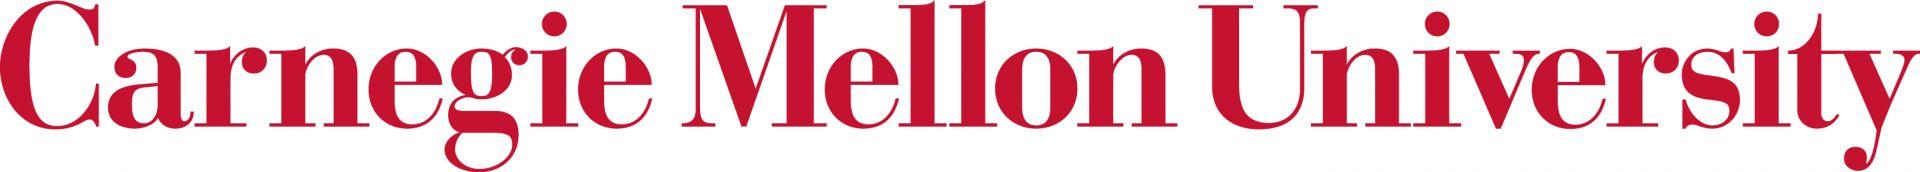 Carnegie Mellon University – Silver